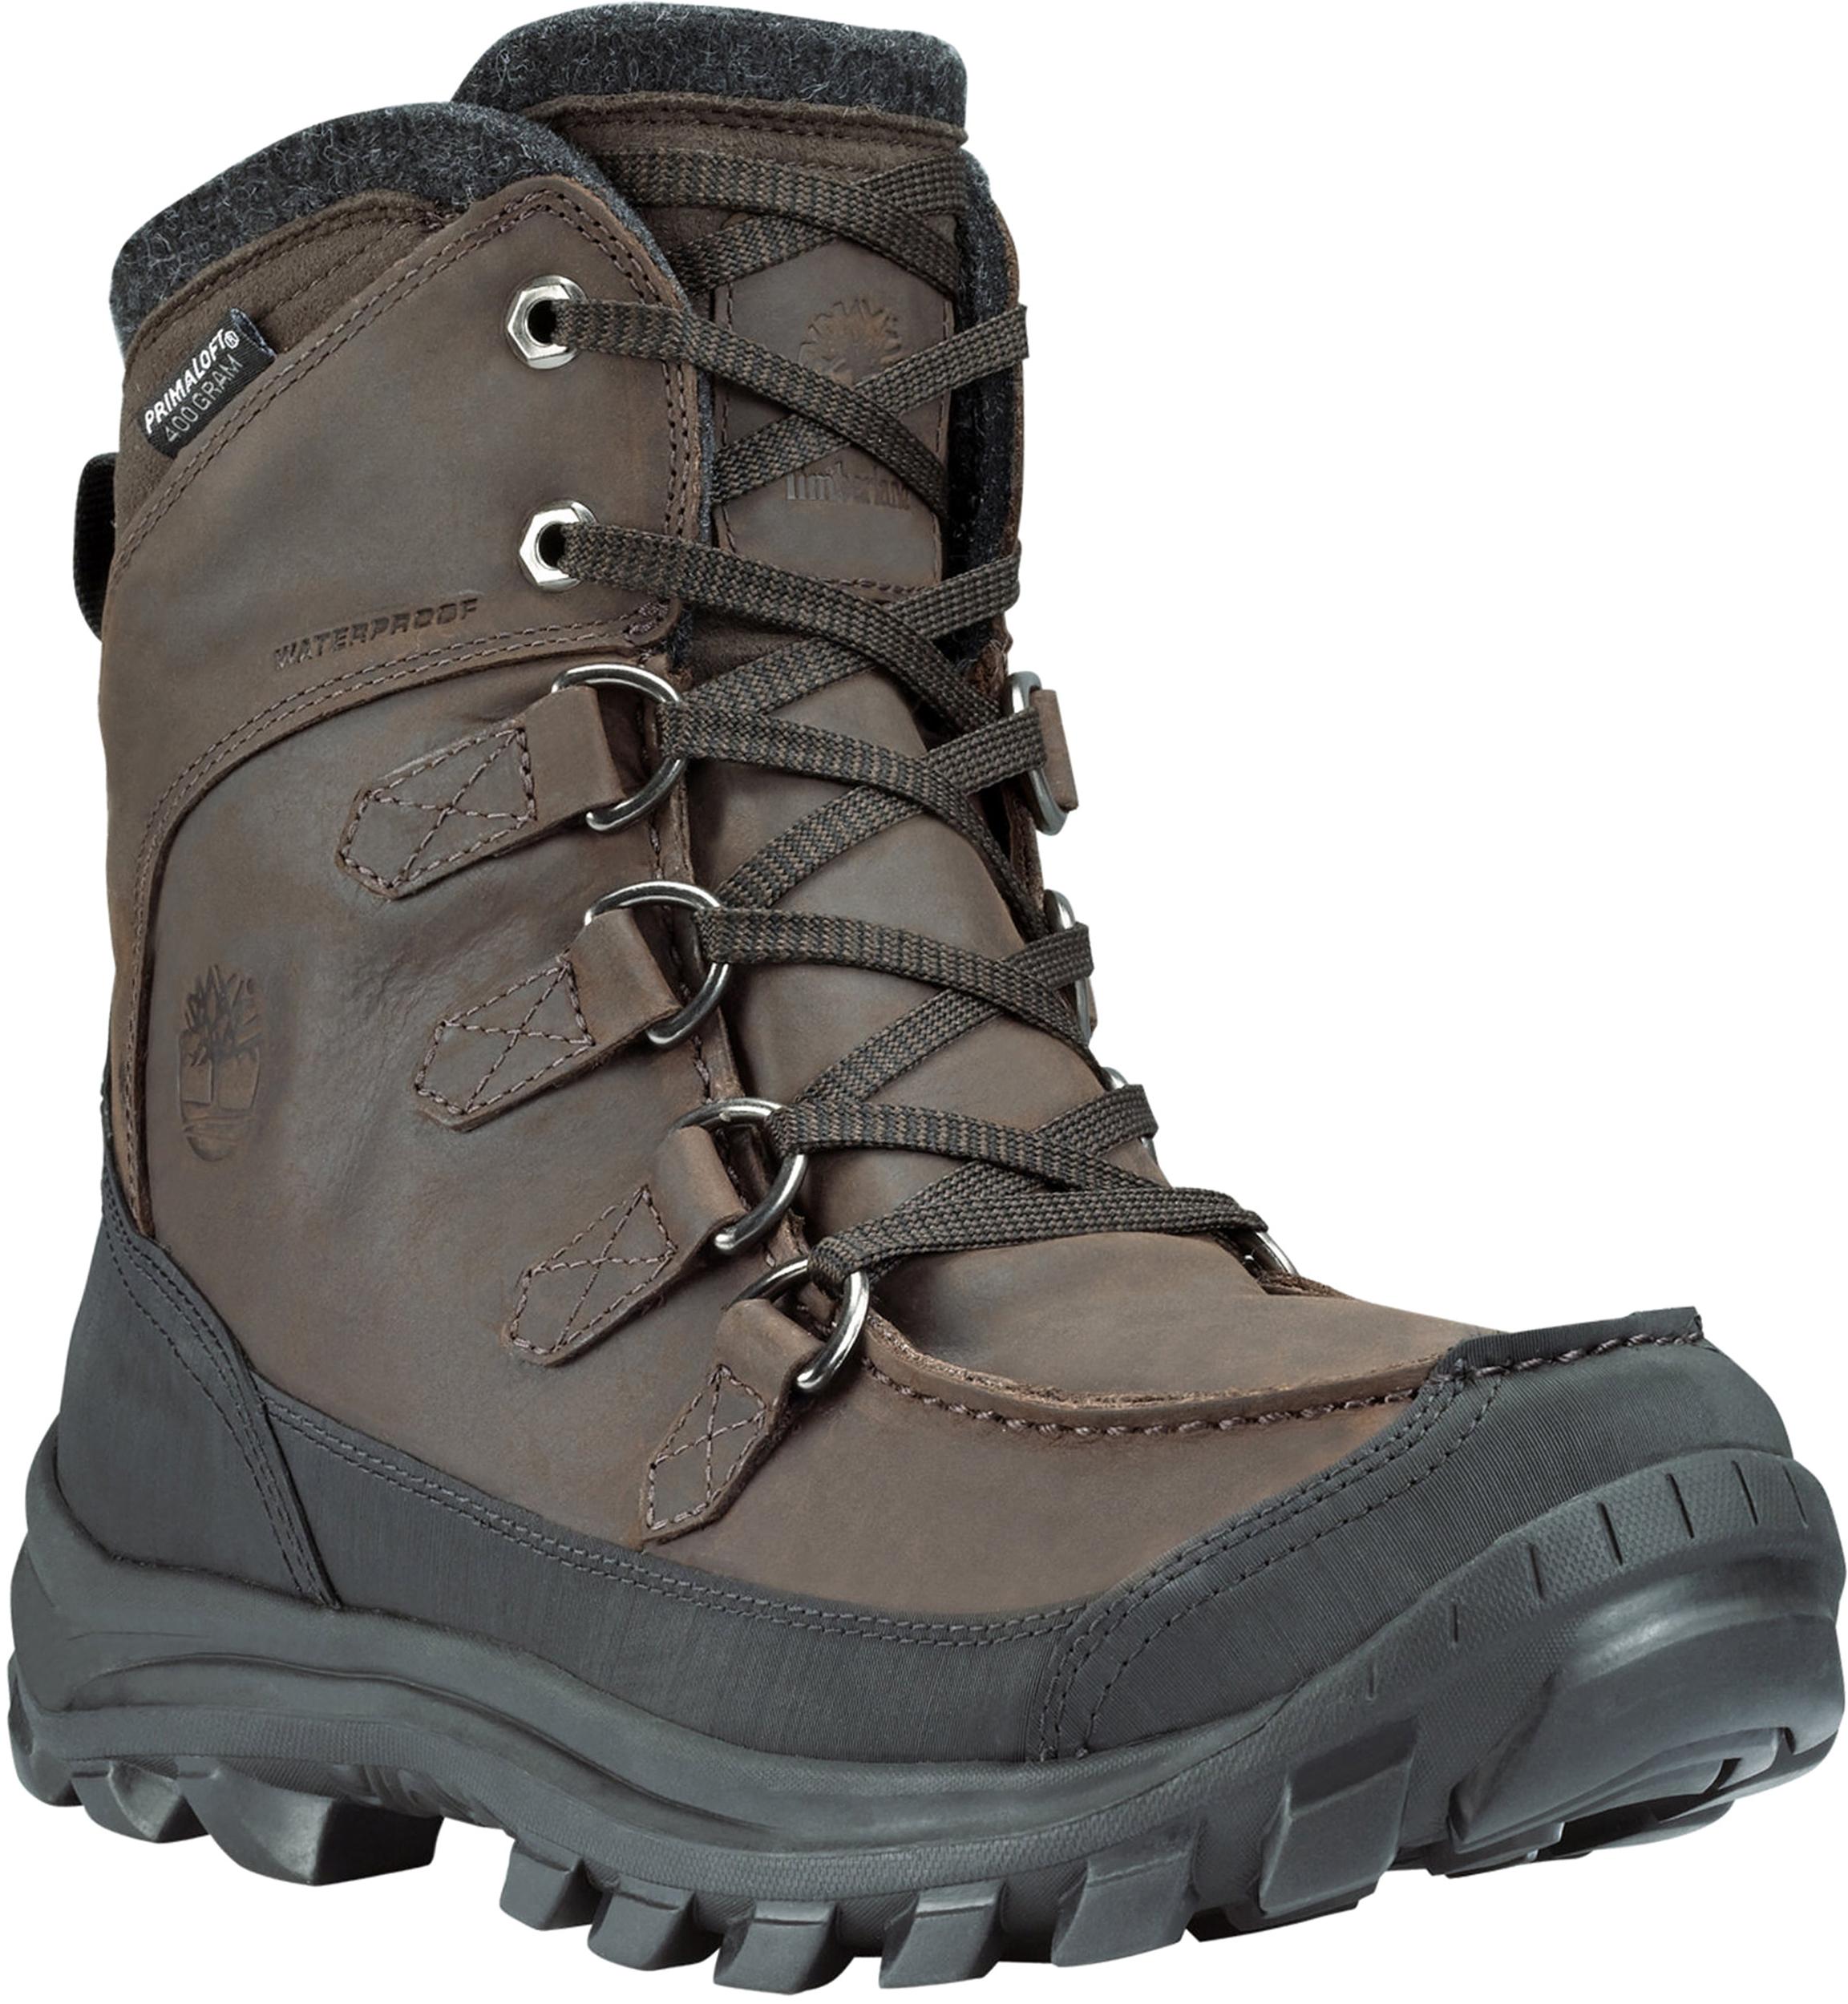 54290ffb4d5 Timberland EK Chillberg Tall Waterproof Boots - Men's